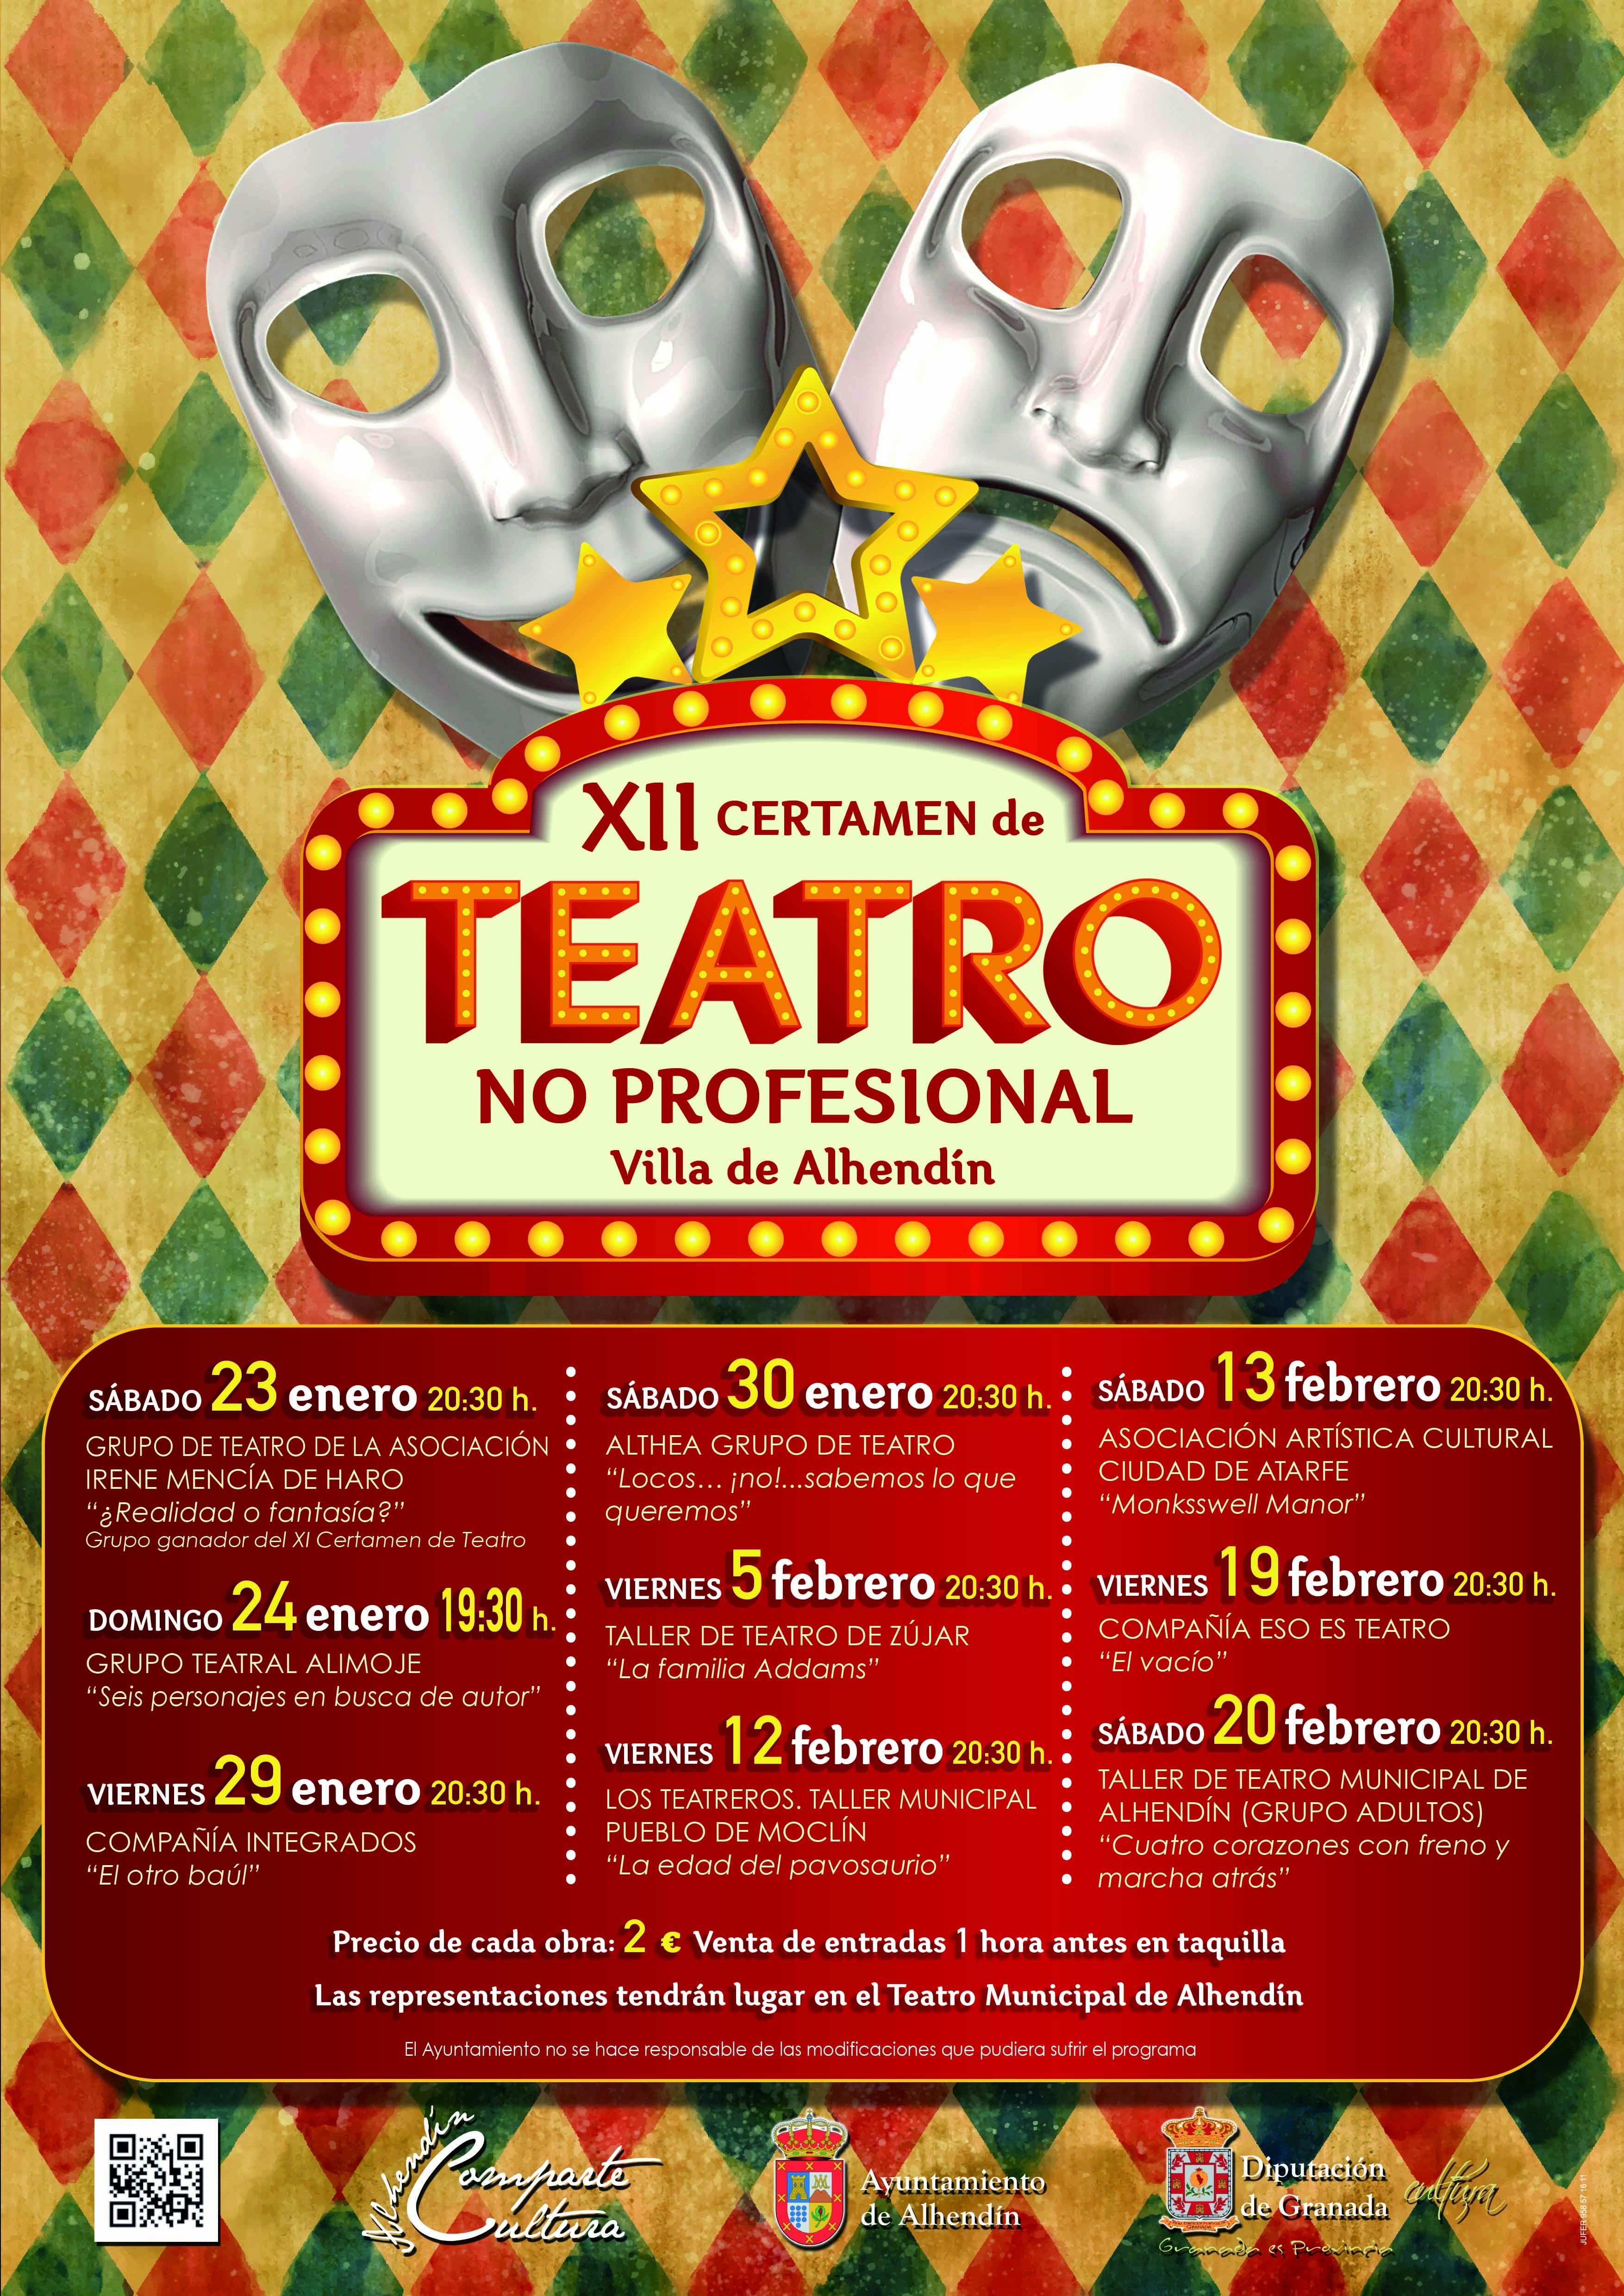 Cartel-XII-Certamen-Teatro-Alhendín